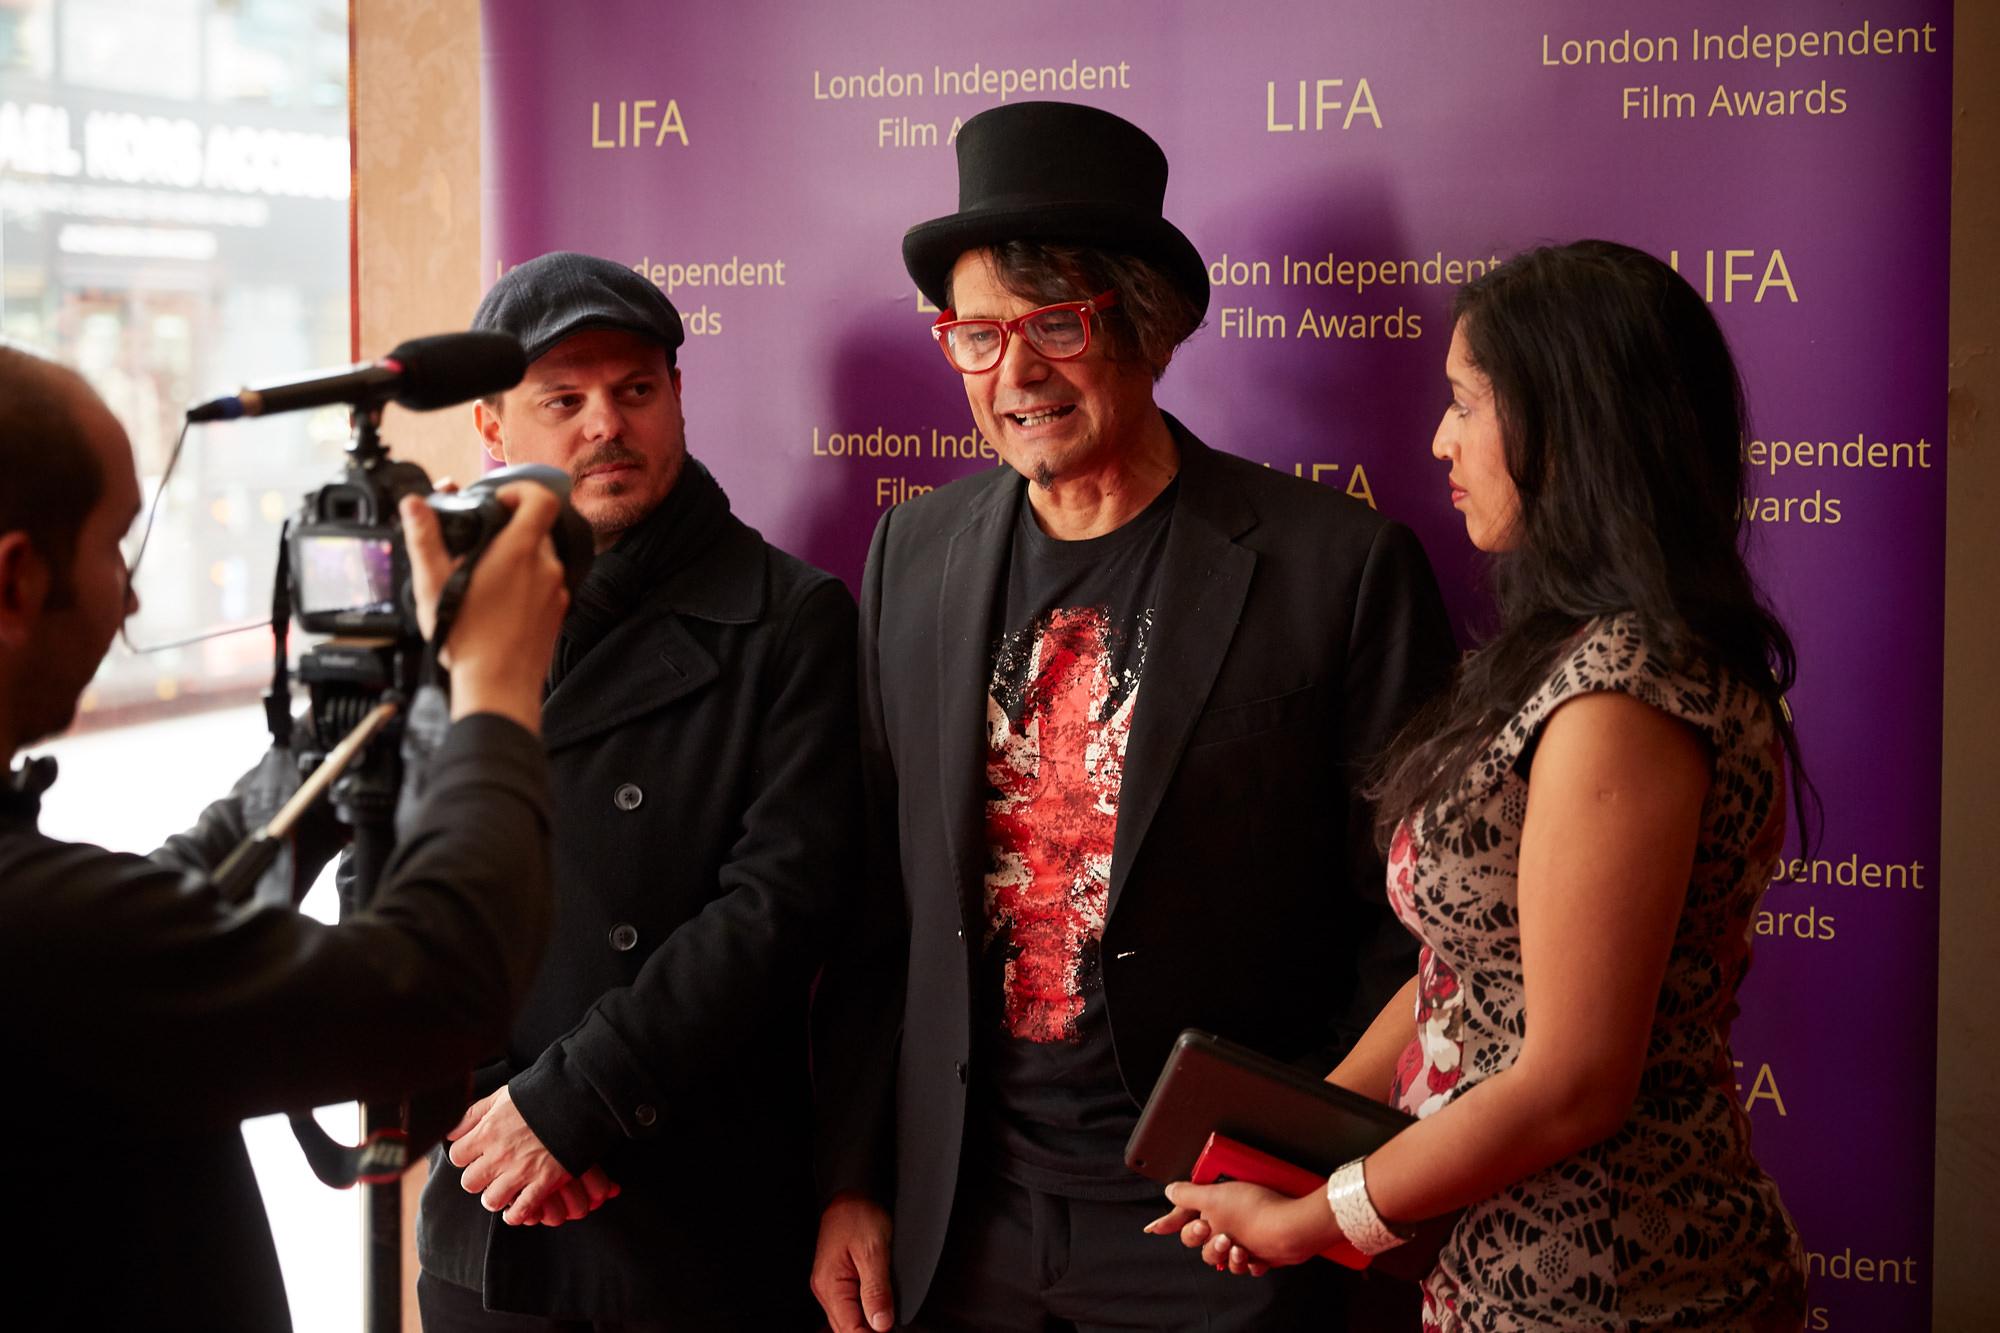 london independent film awards event photographer